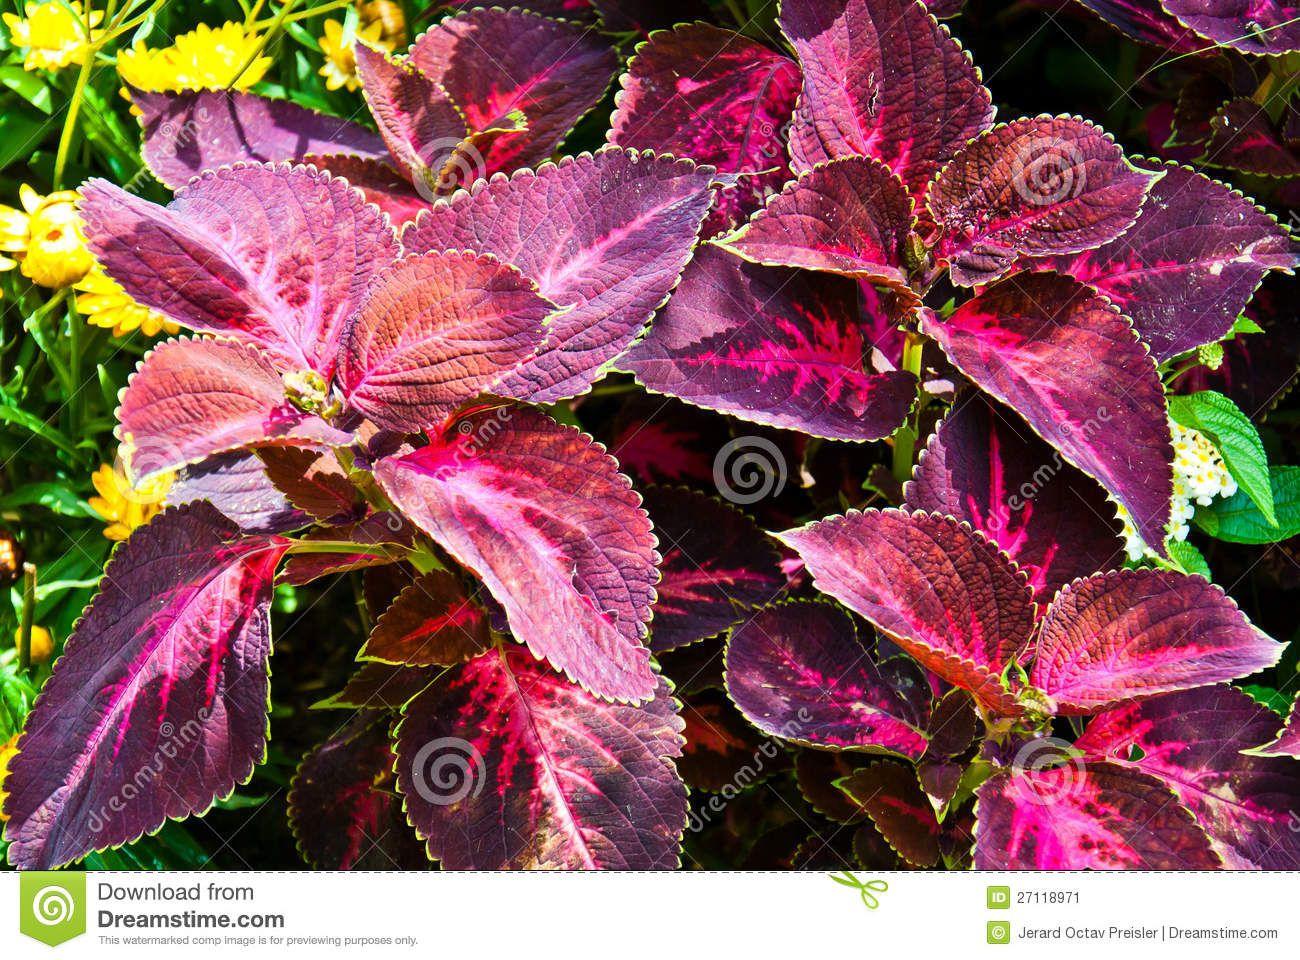 durable foliage plants |  flaming magenta foliage. coleus